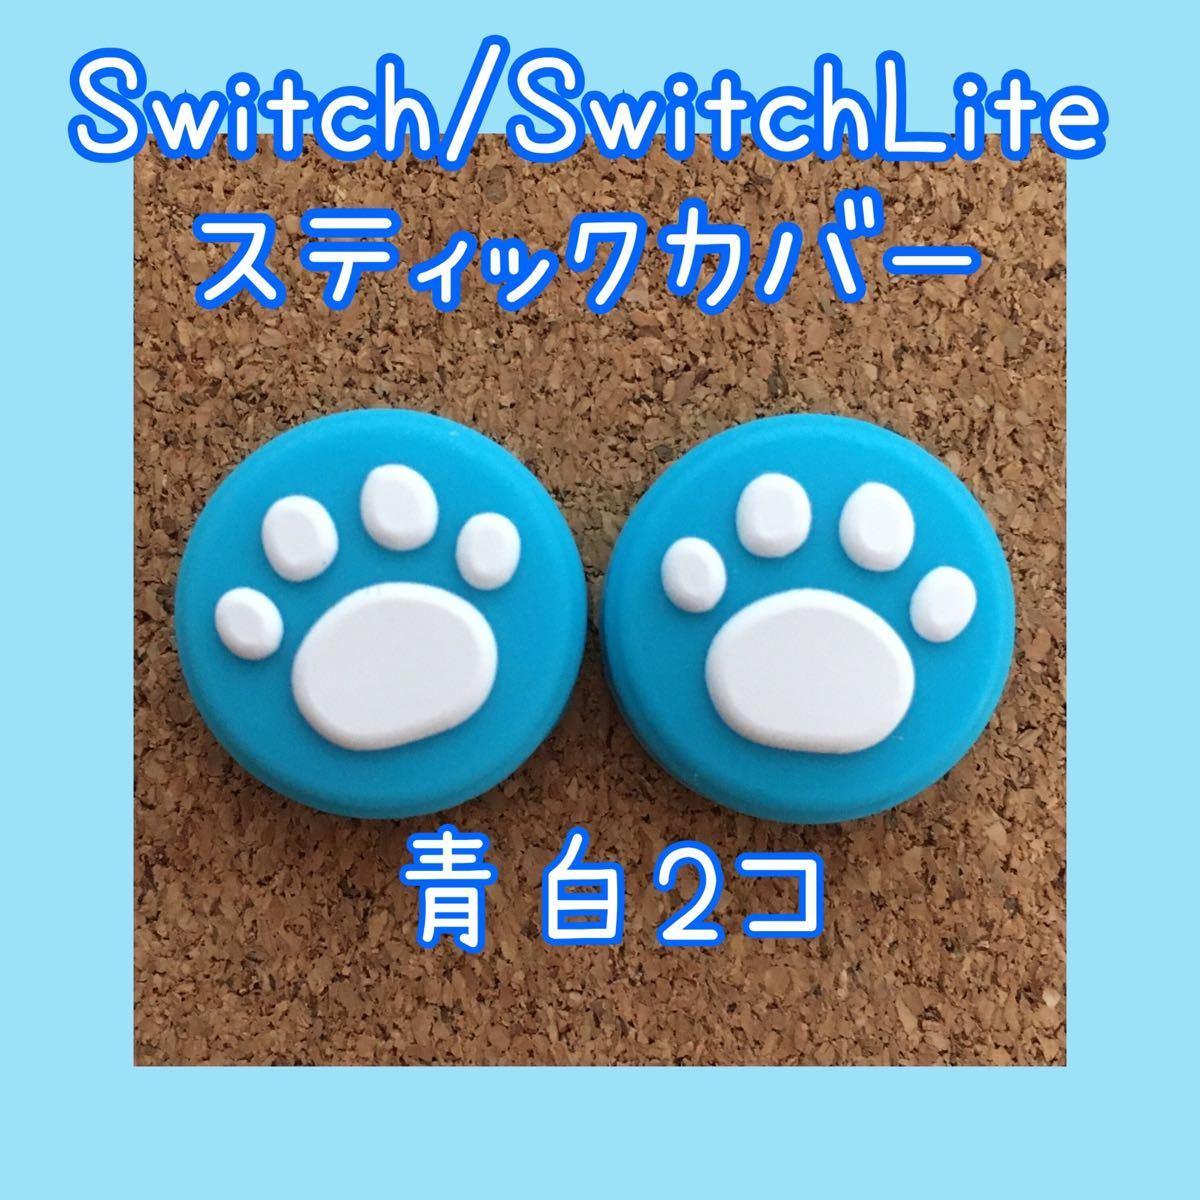 Switch スイッチ ジョイコン スティックカバー 肉球 2個【青白】